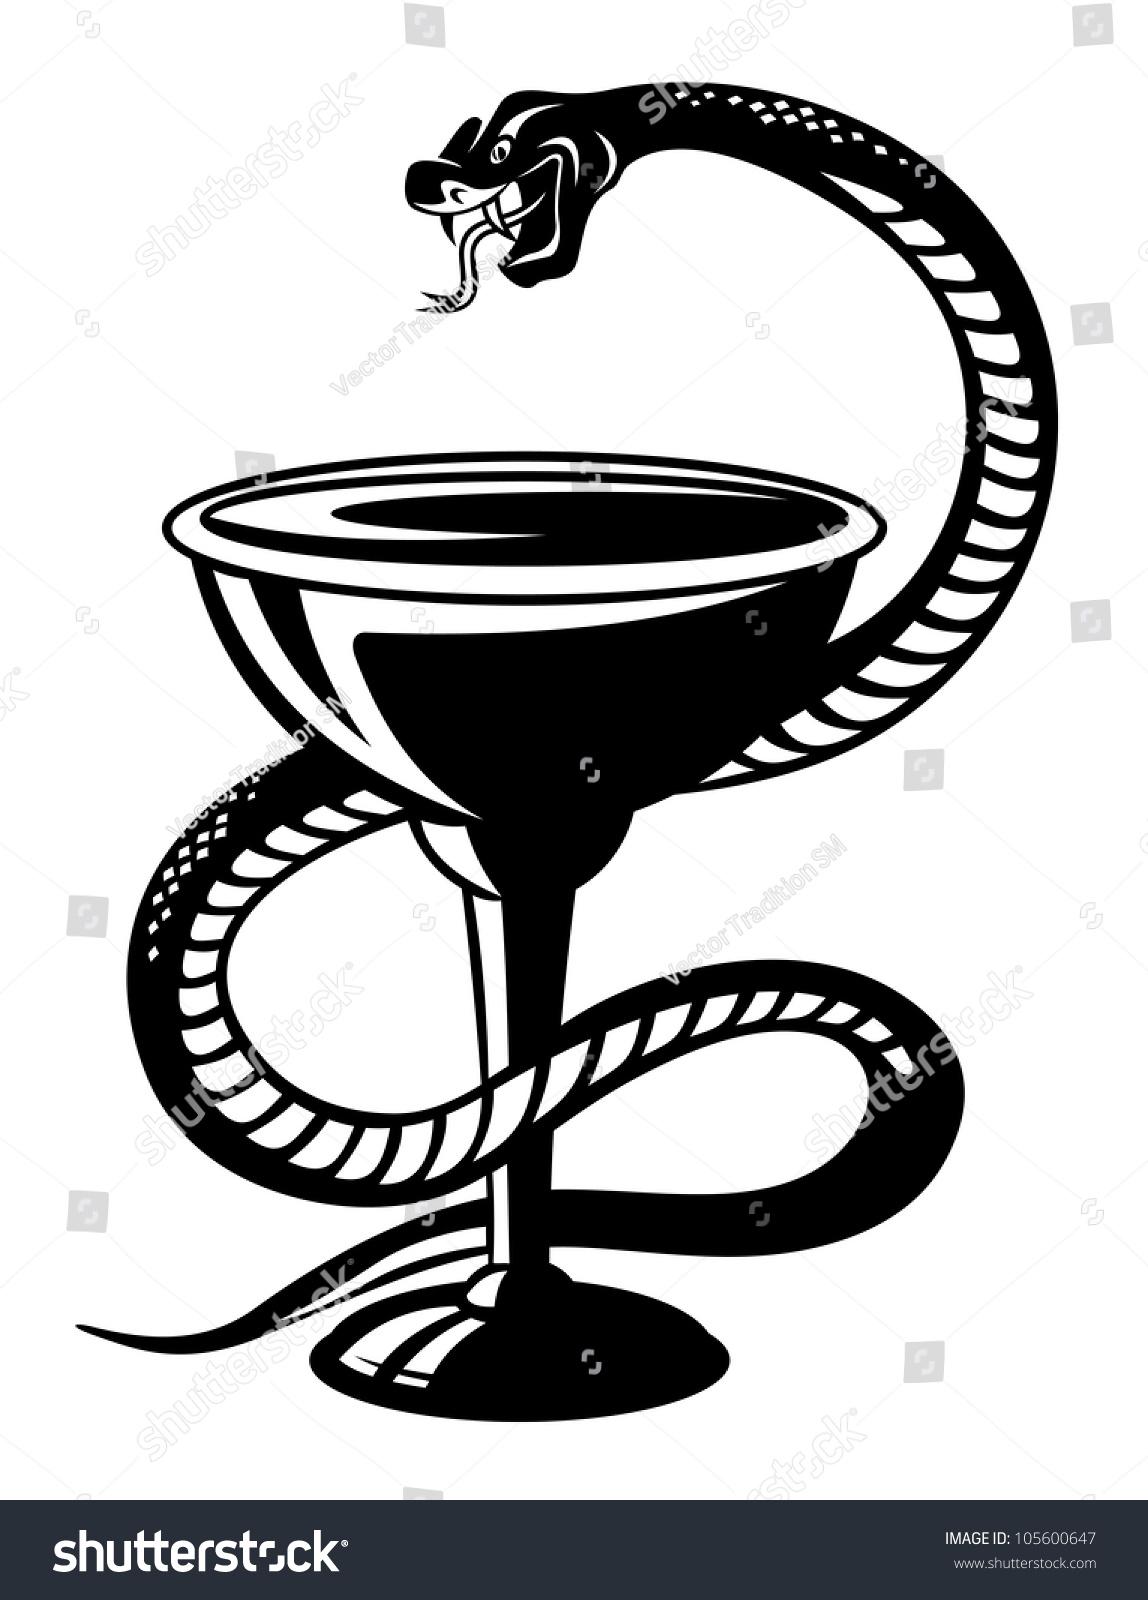 Змея символ медицины картинки 2